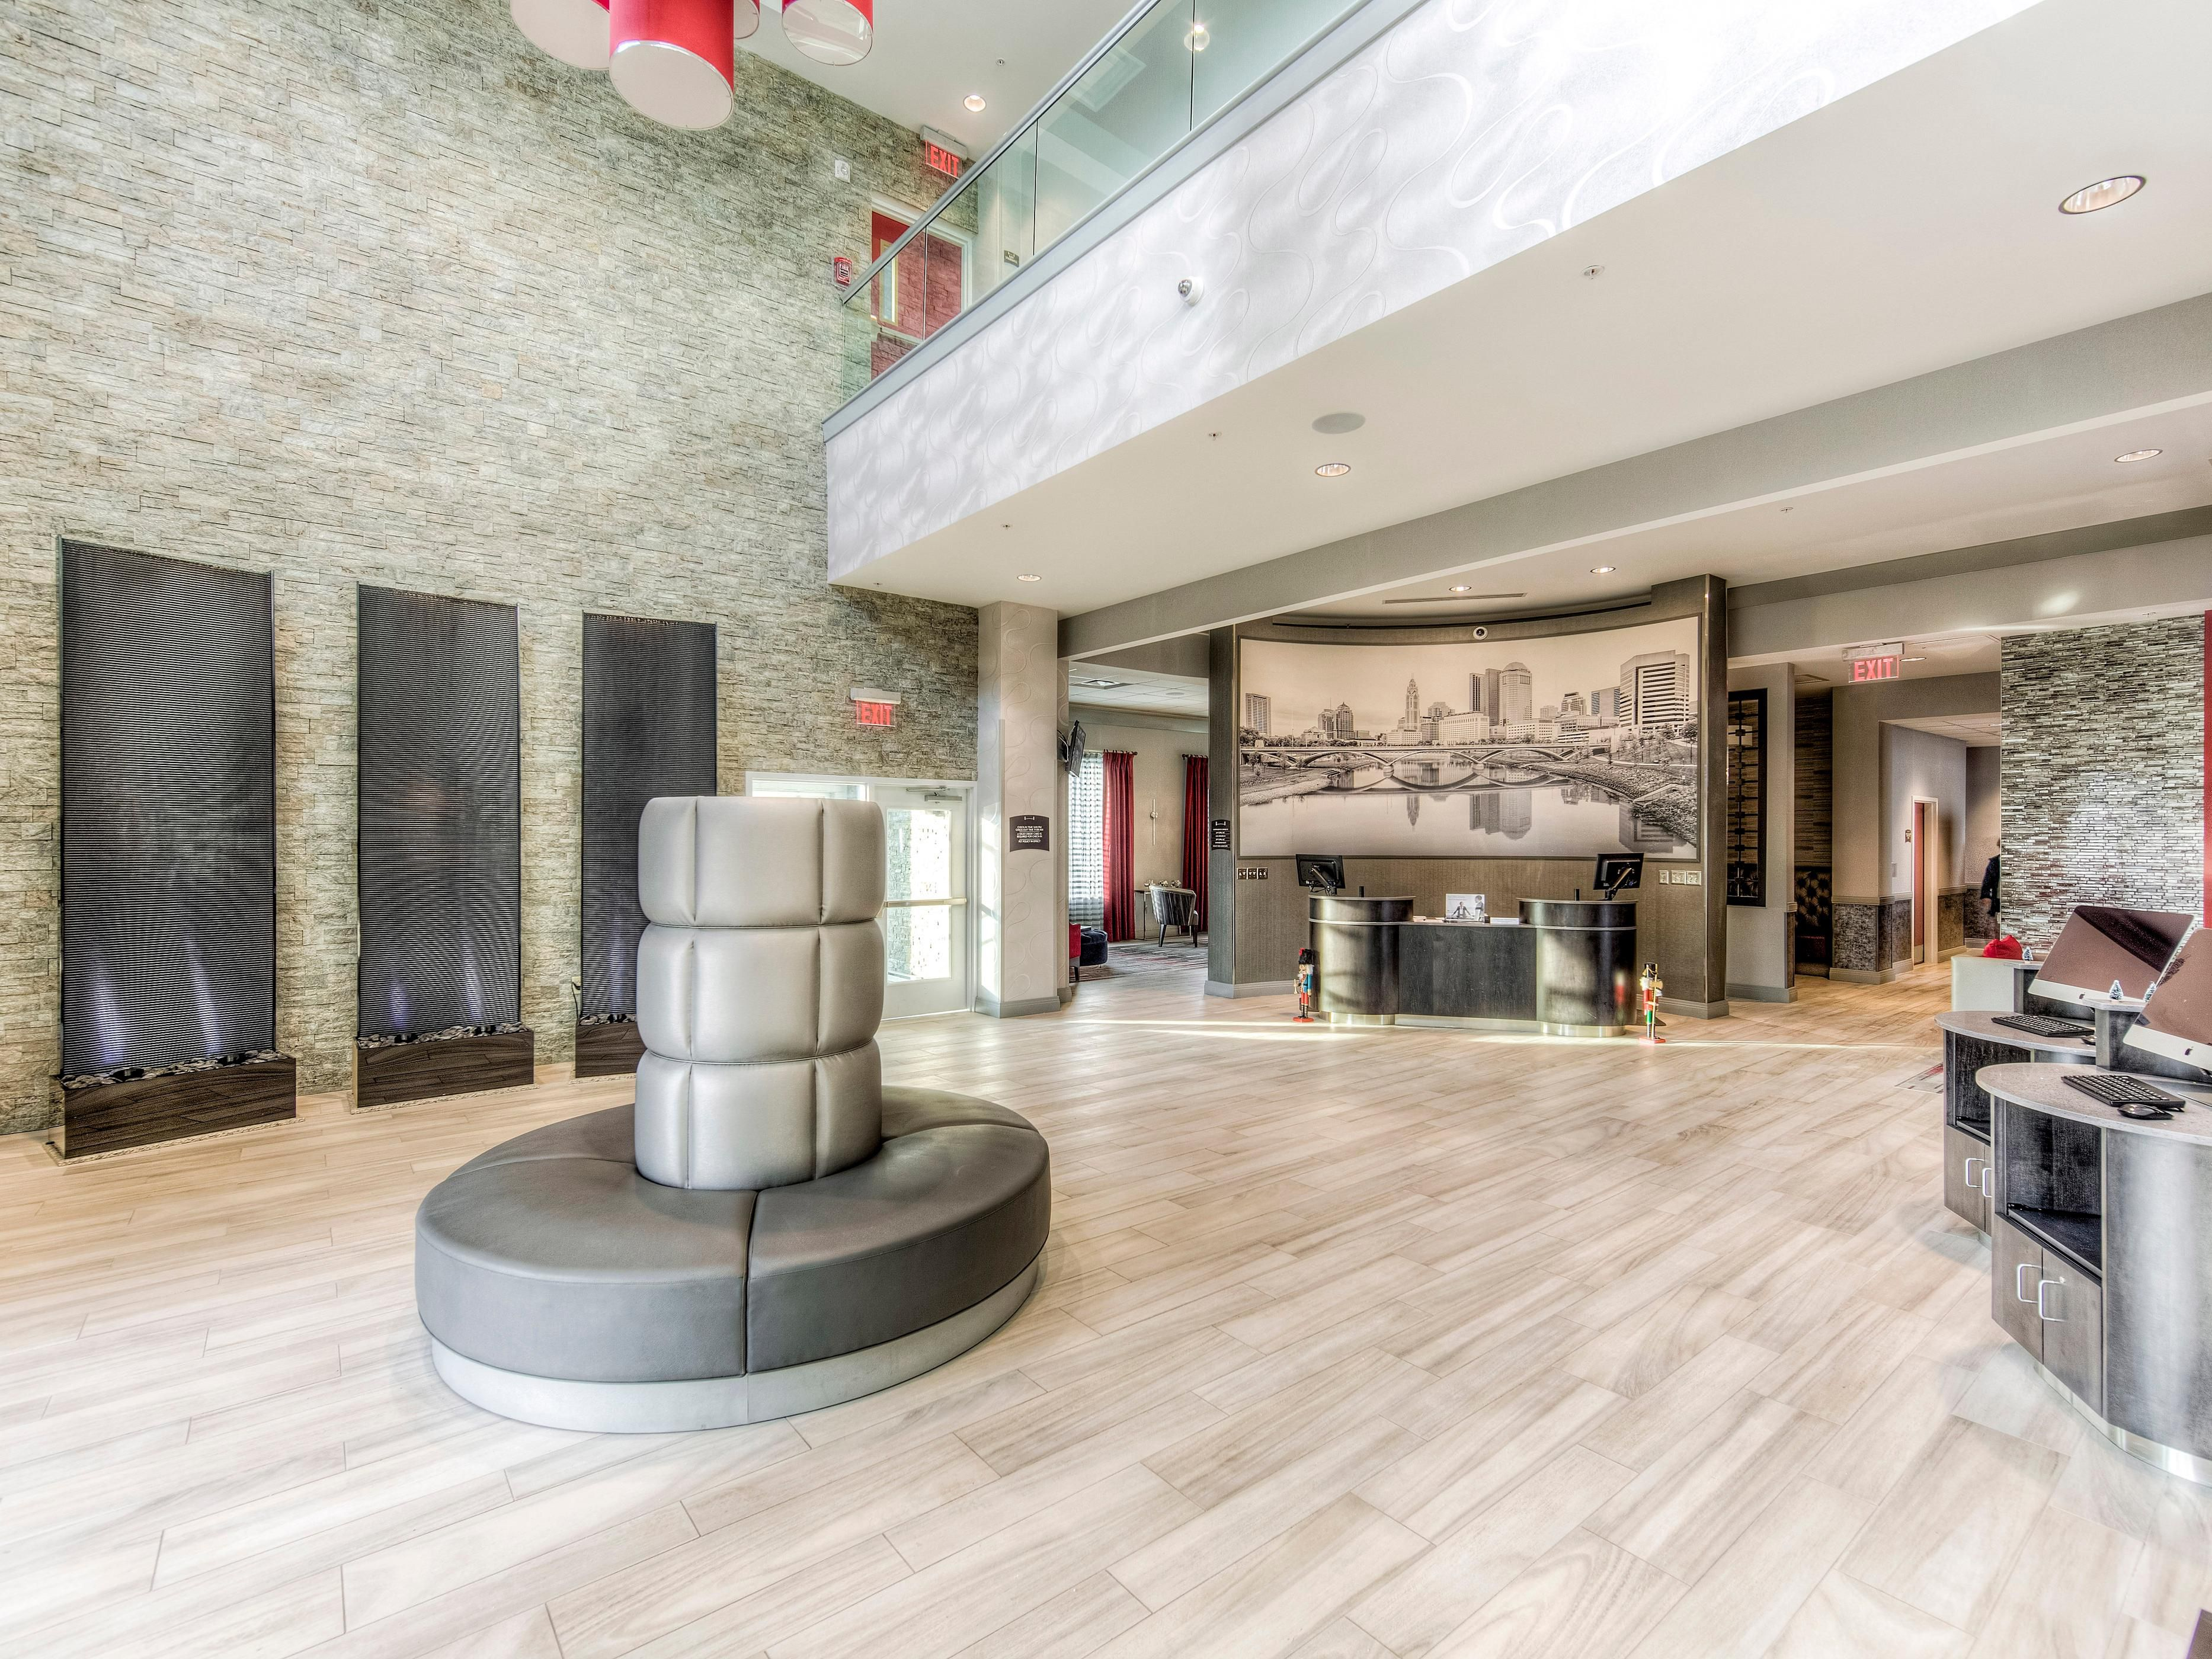 Holiday Inn Express Hotel & Suites Columbus University